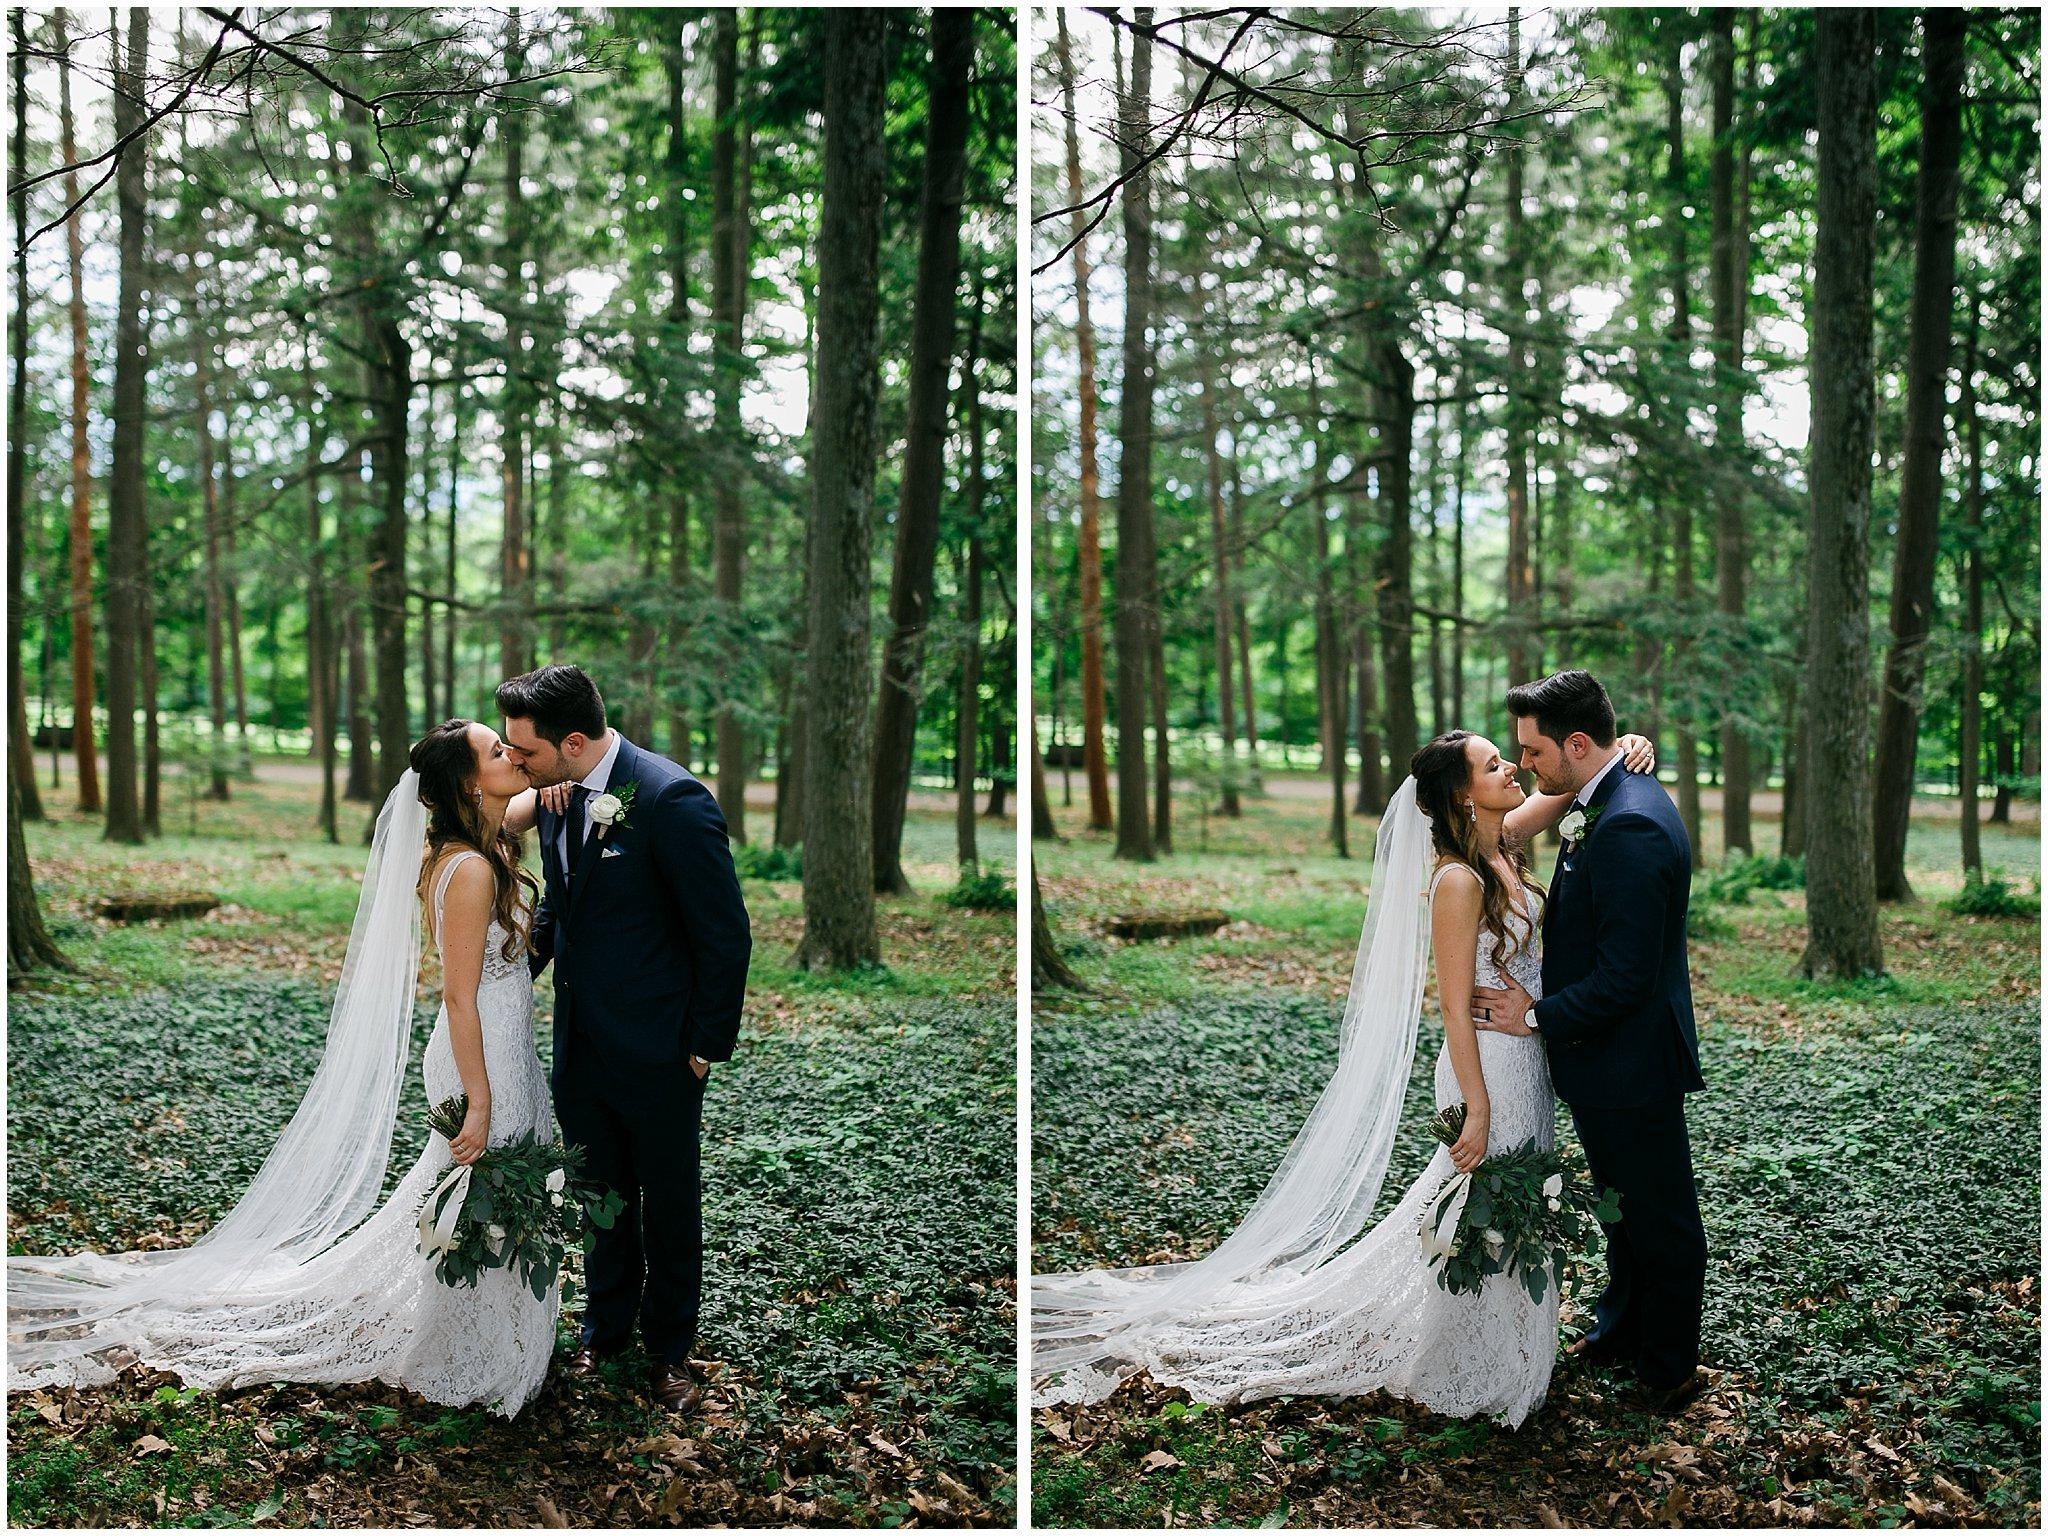 Hudson Valley Weddings at the Hill Hudson New York Wedding Photographer74.jpg